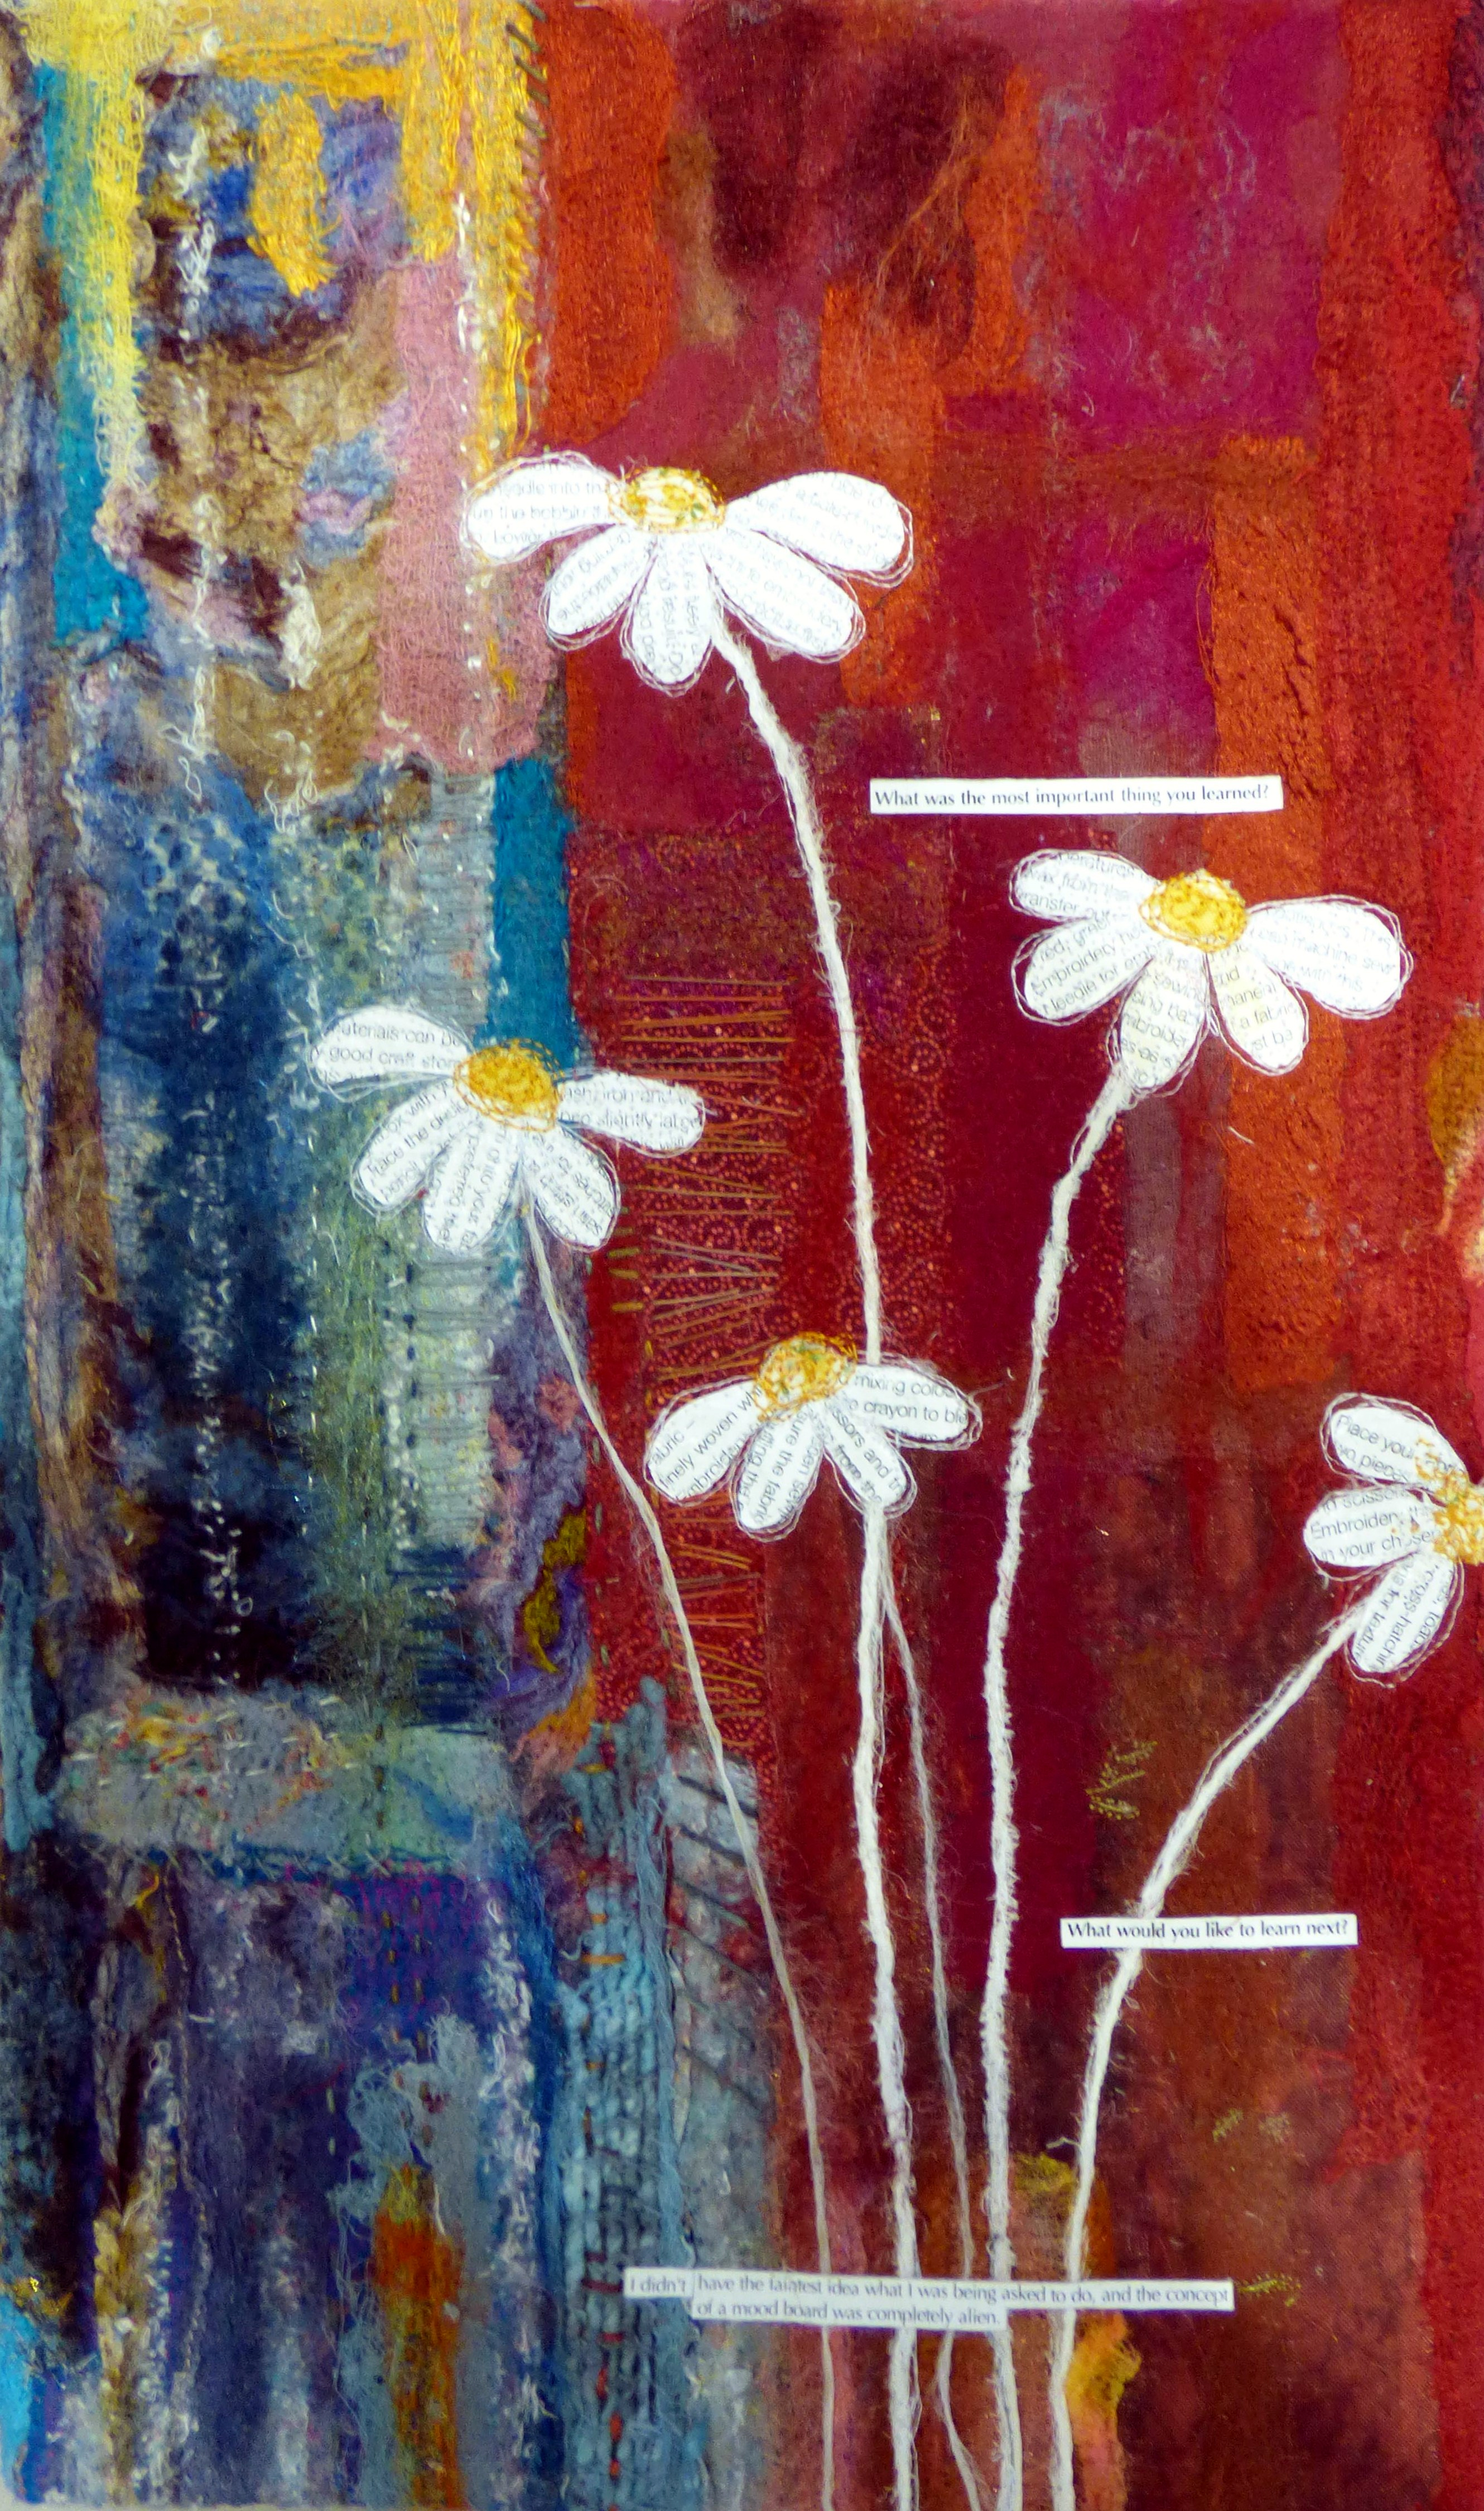 DAISIES by Miriam Forder, N.Wales EG, mixed media